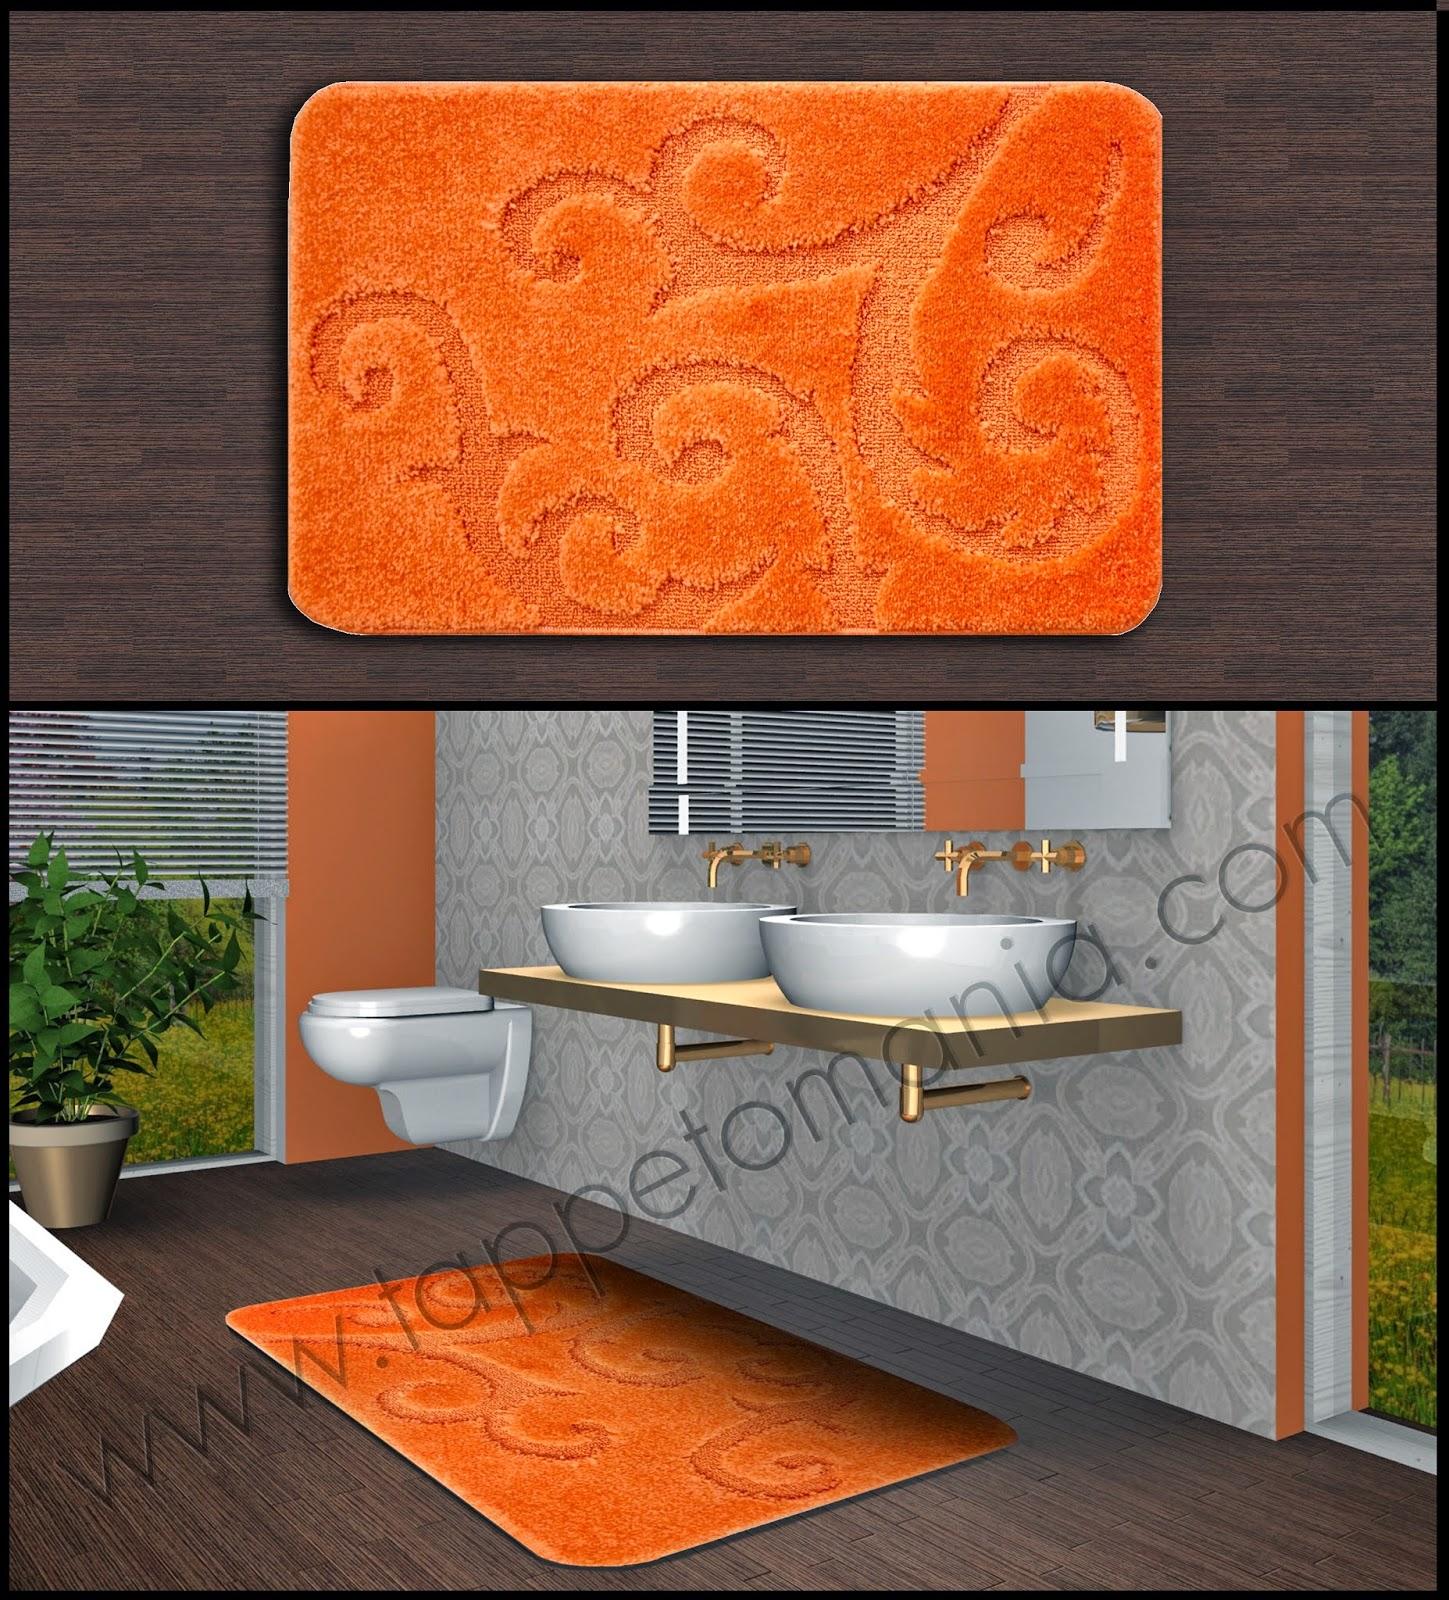 tappeti bagno moderni prezzi  Tappeti in Bamboo per ...